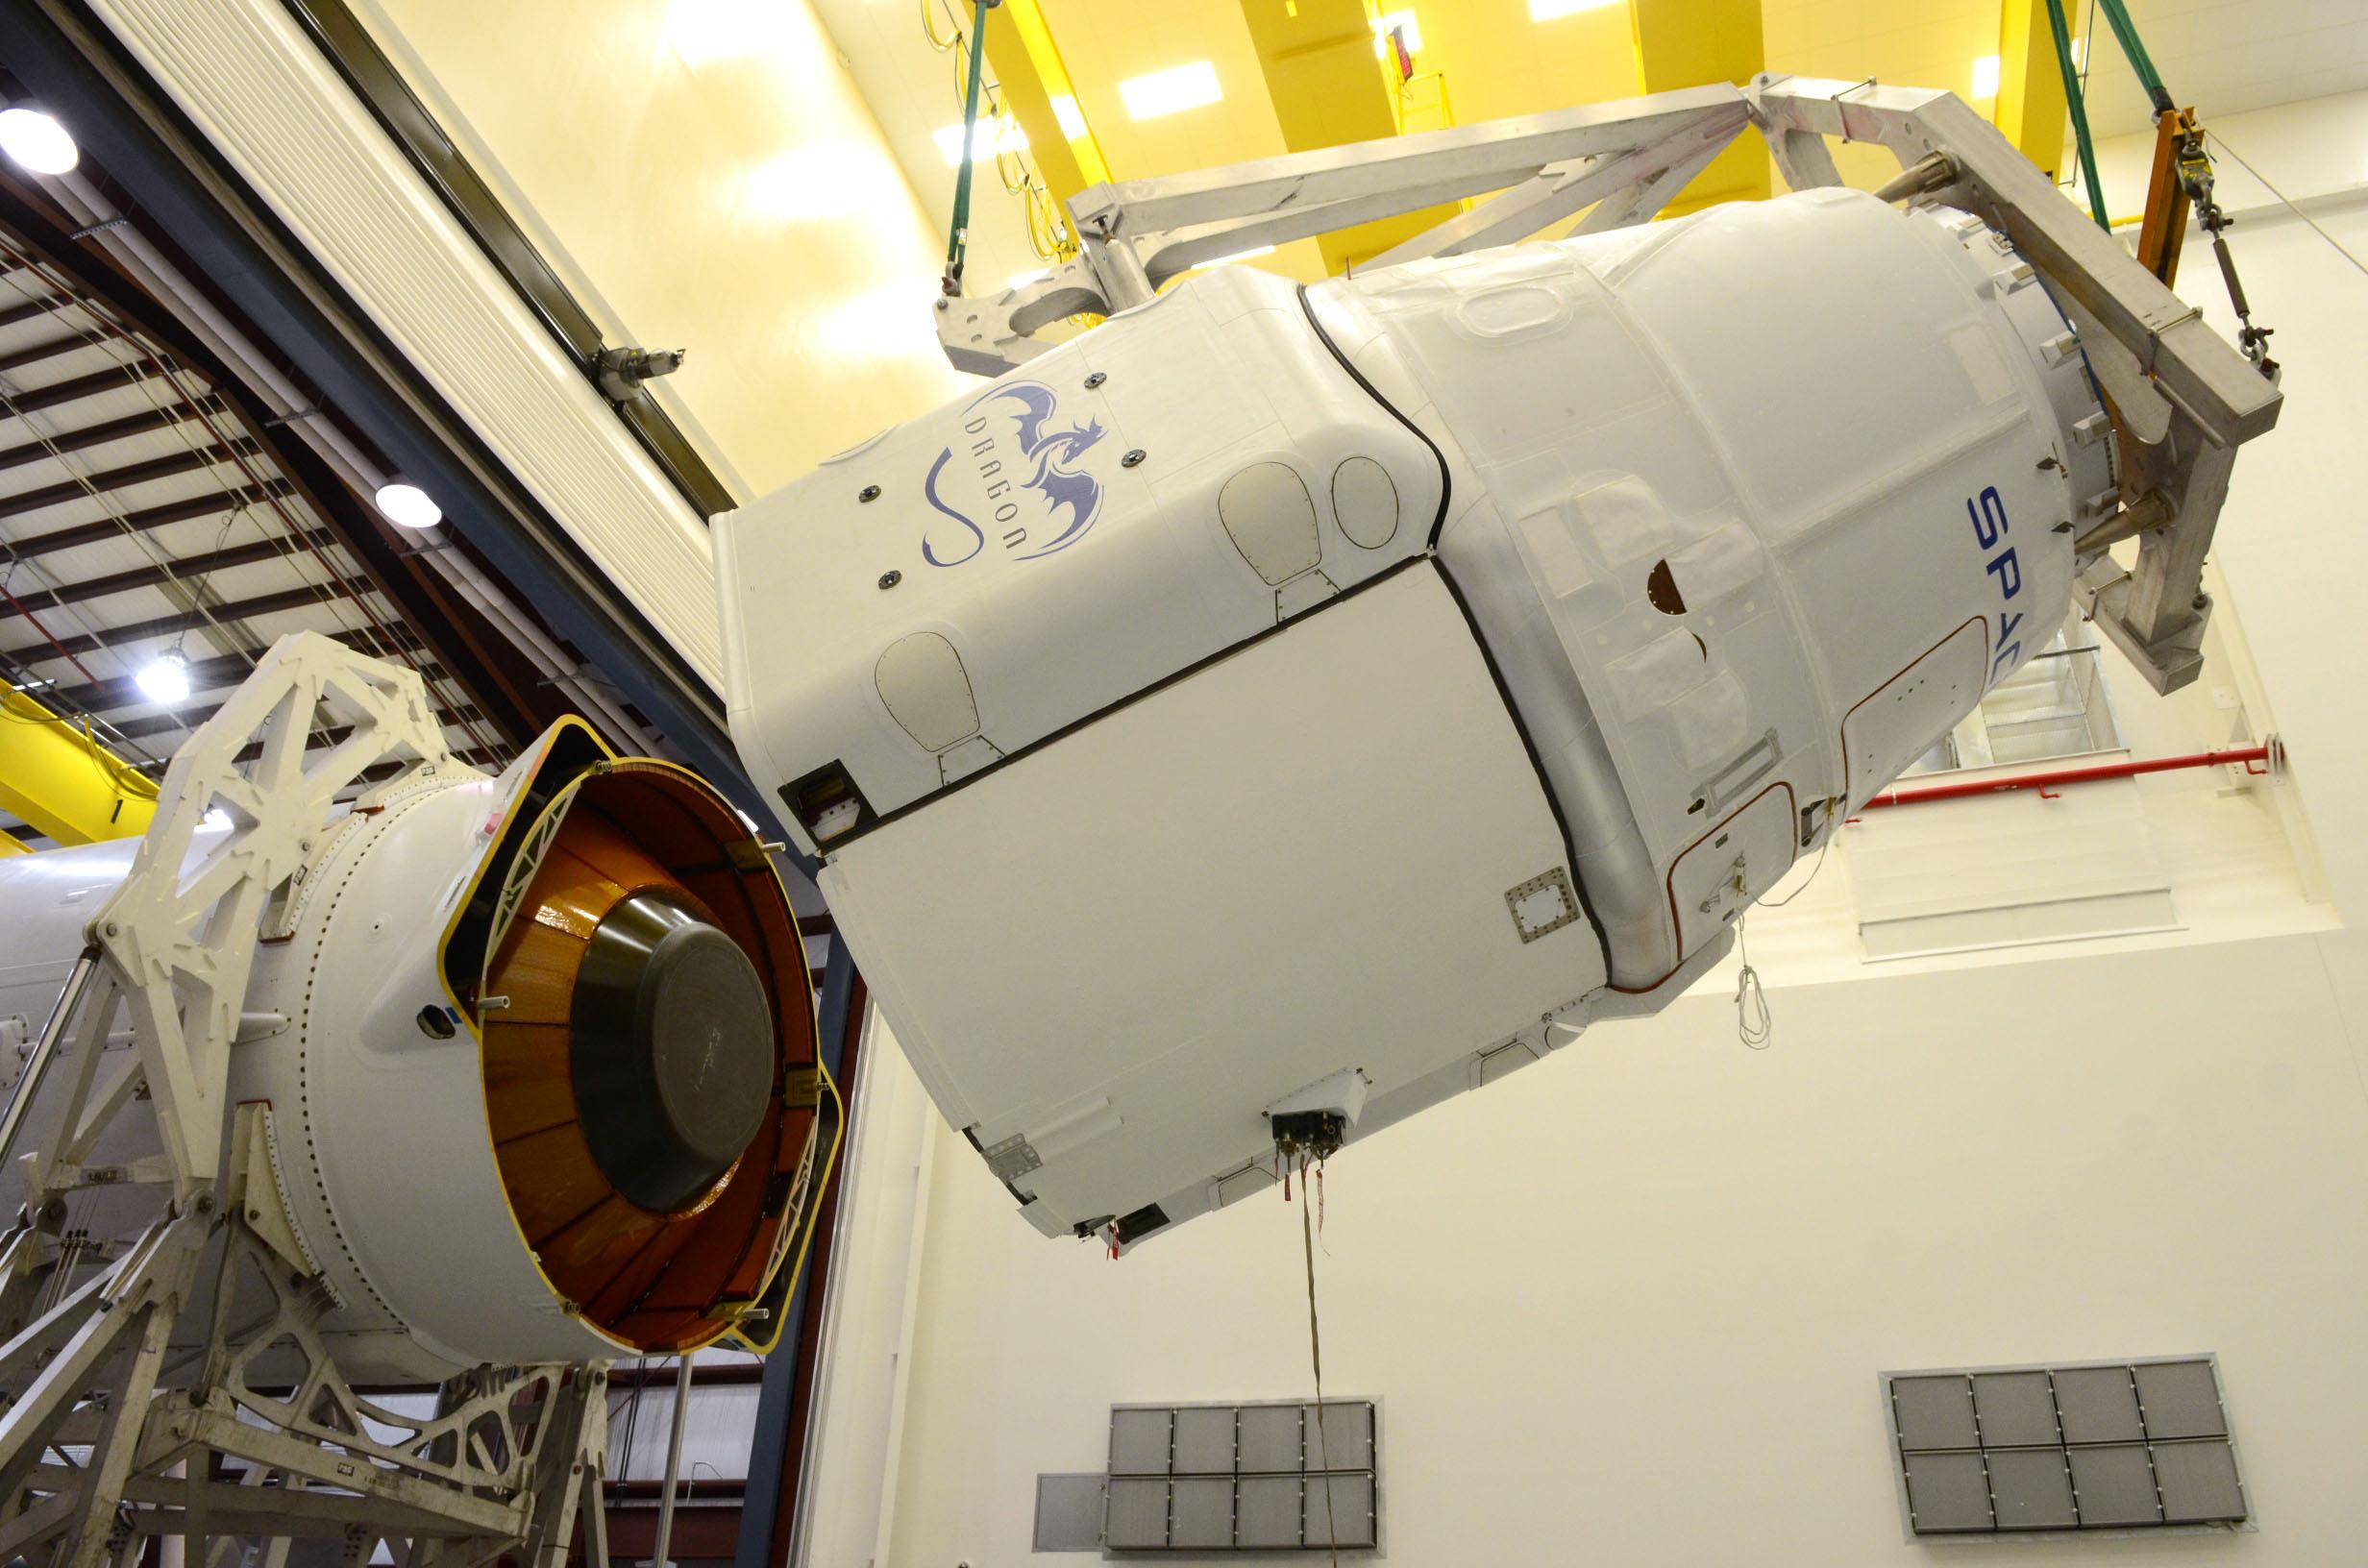 CRS-3_Dragon_mating_with_Falcon_9_rocket_in_SLC-40_hangar_(16649075267).jpg